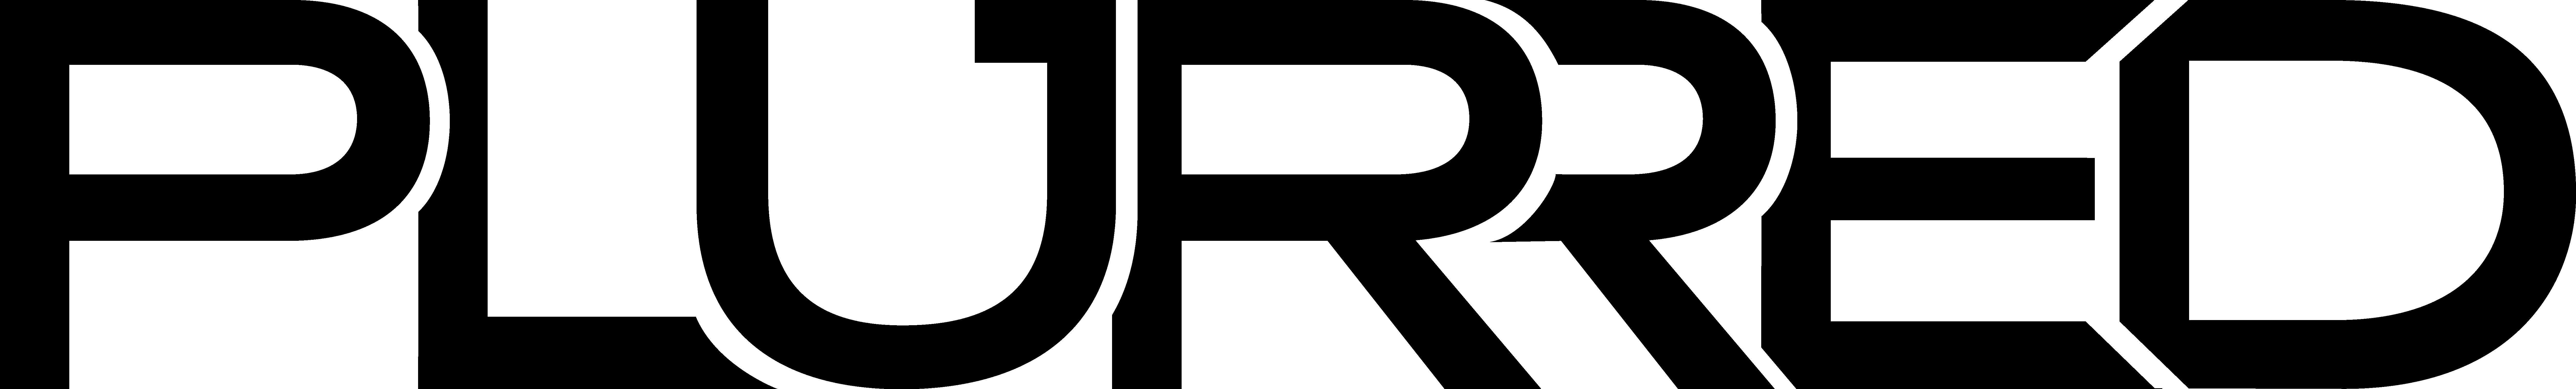 PLURRED's logo